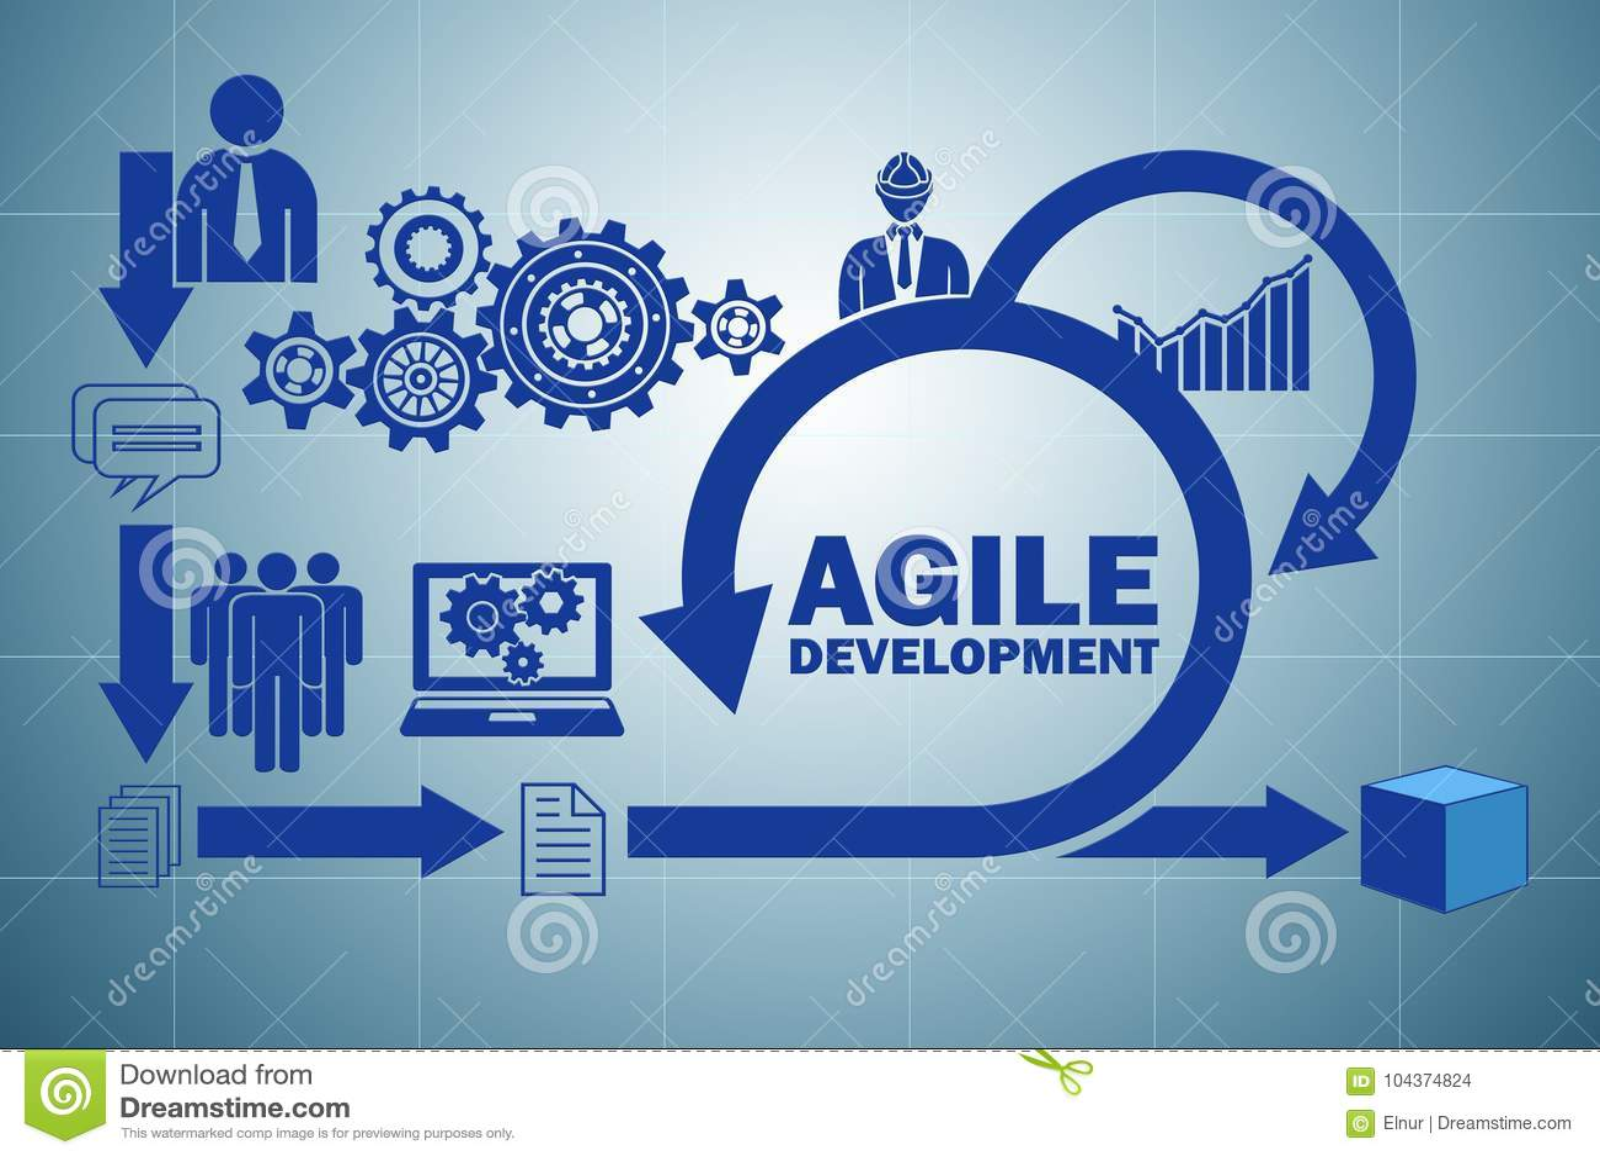 The concept of agile software development